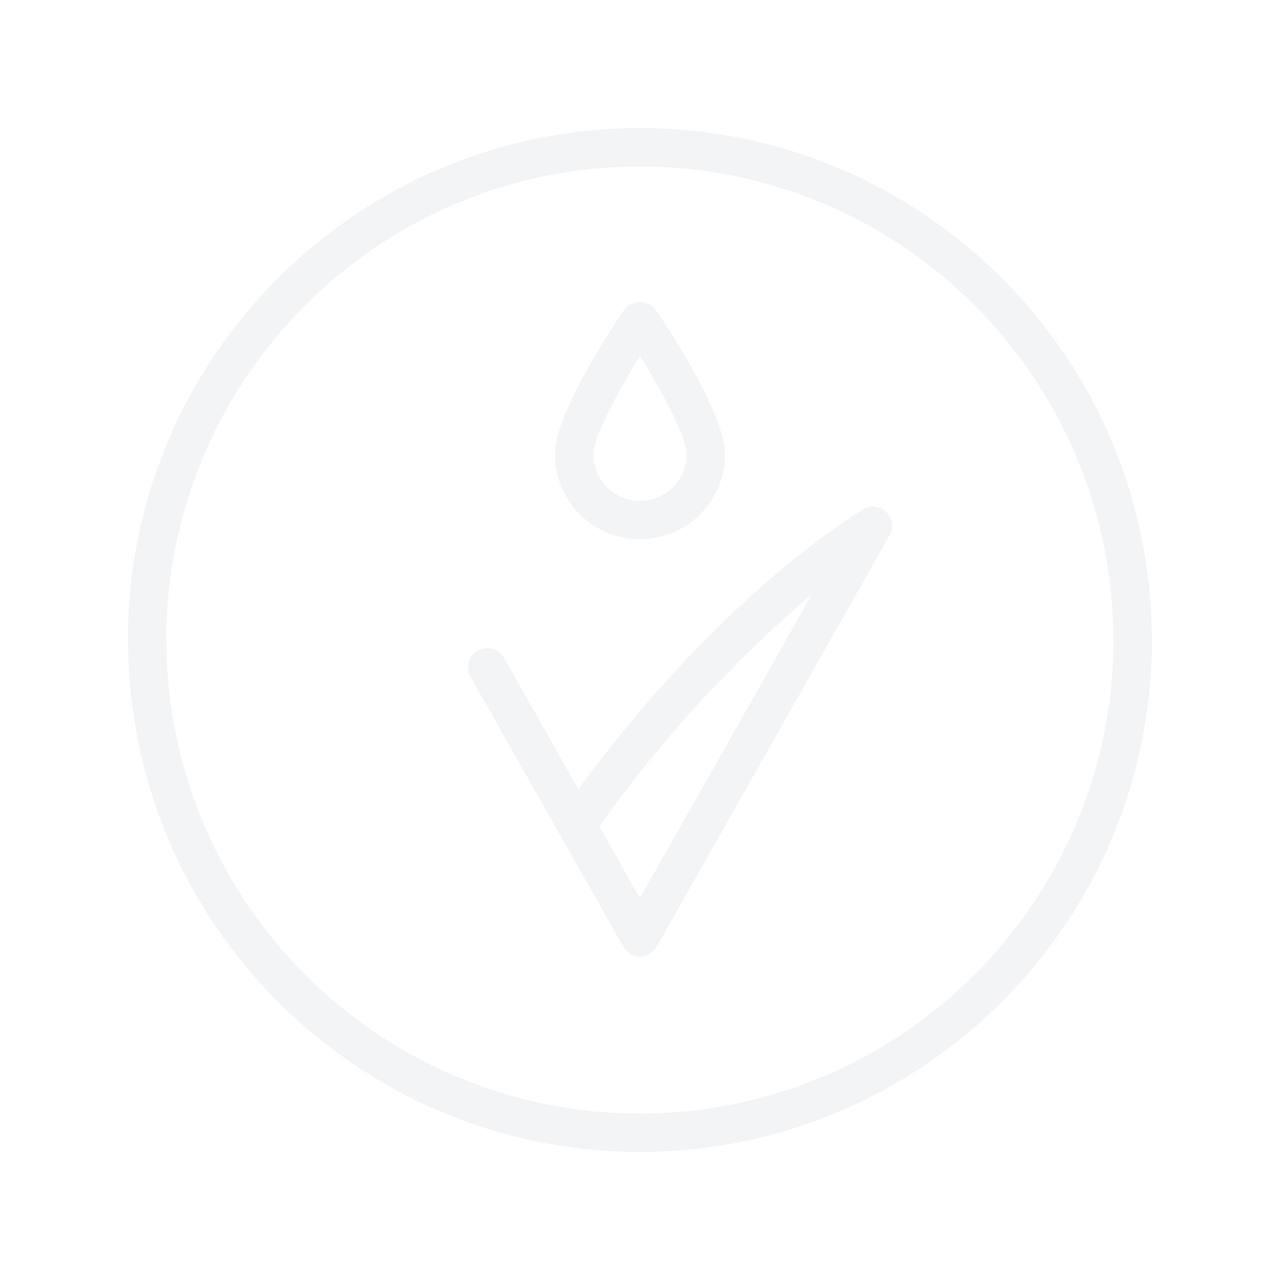 LIERAC Hydragenist Rose Lip Balm 3g